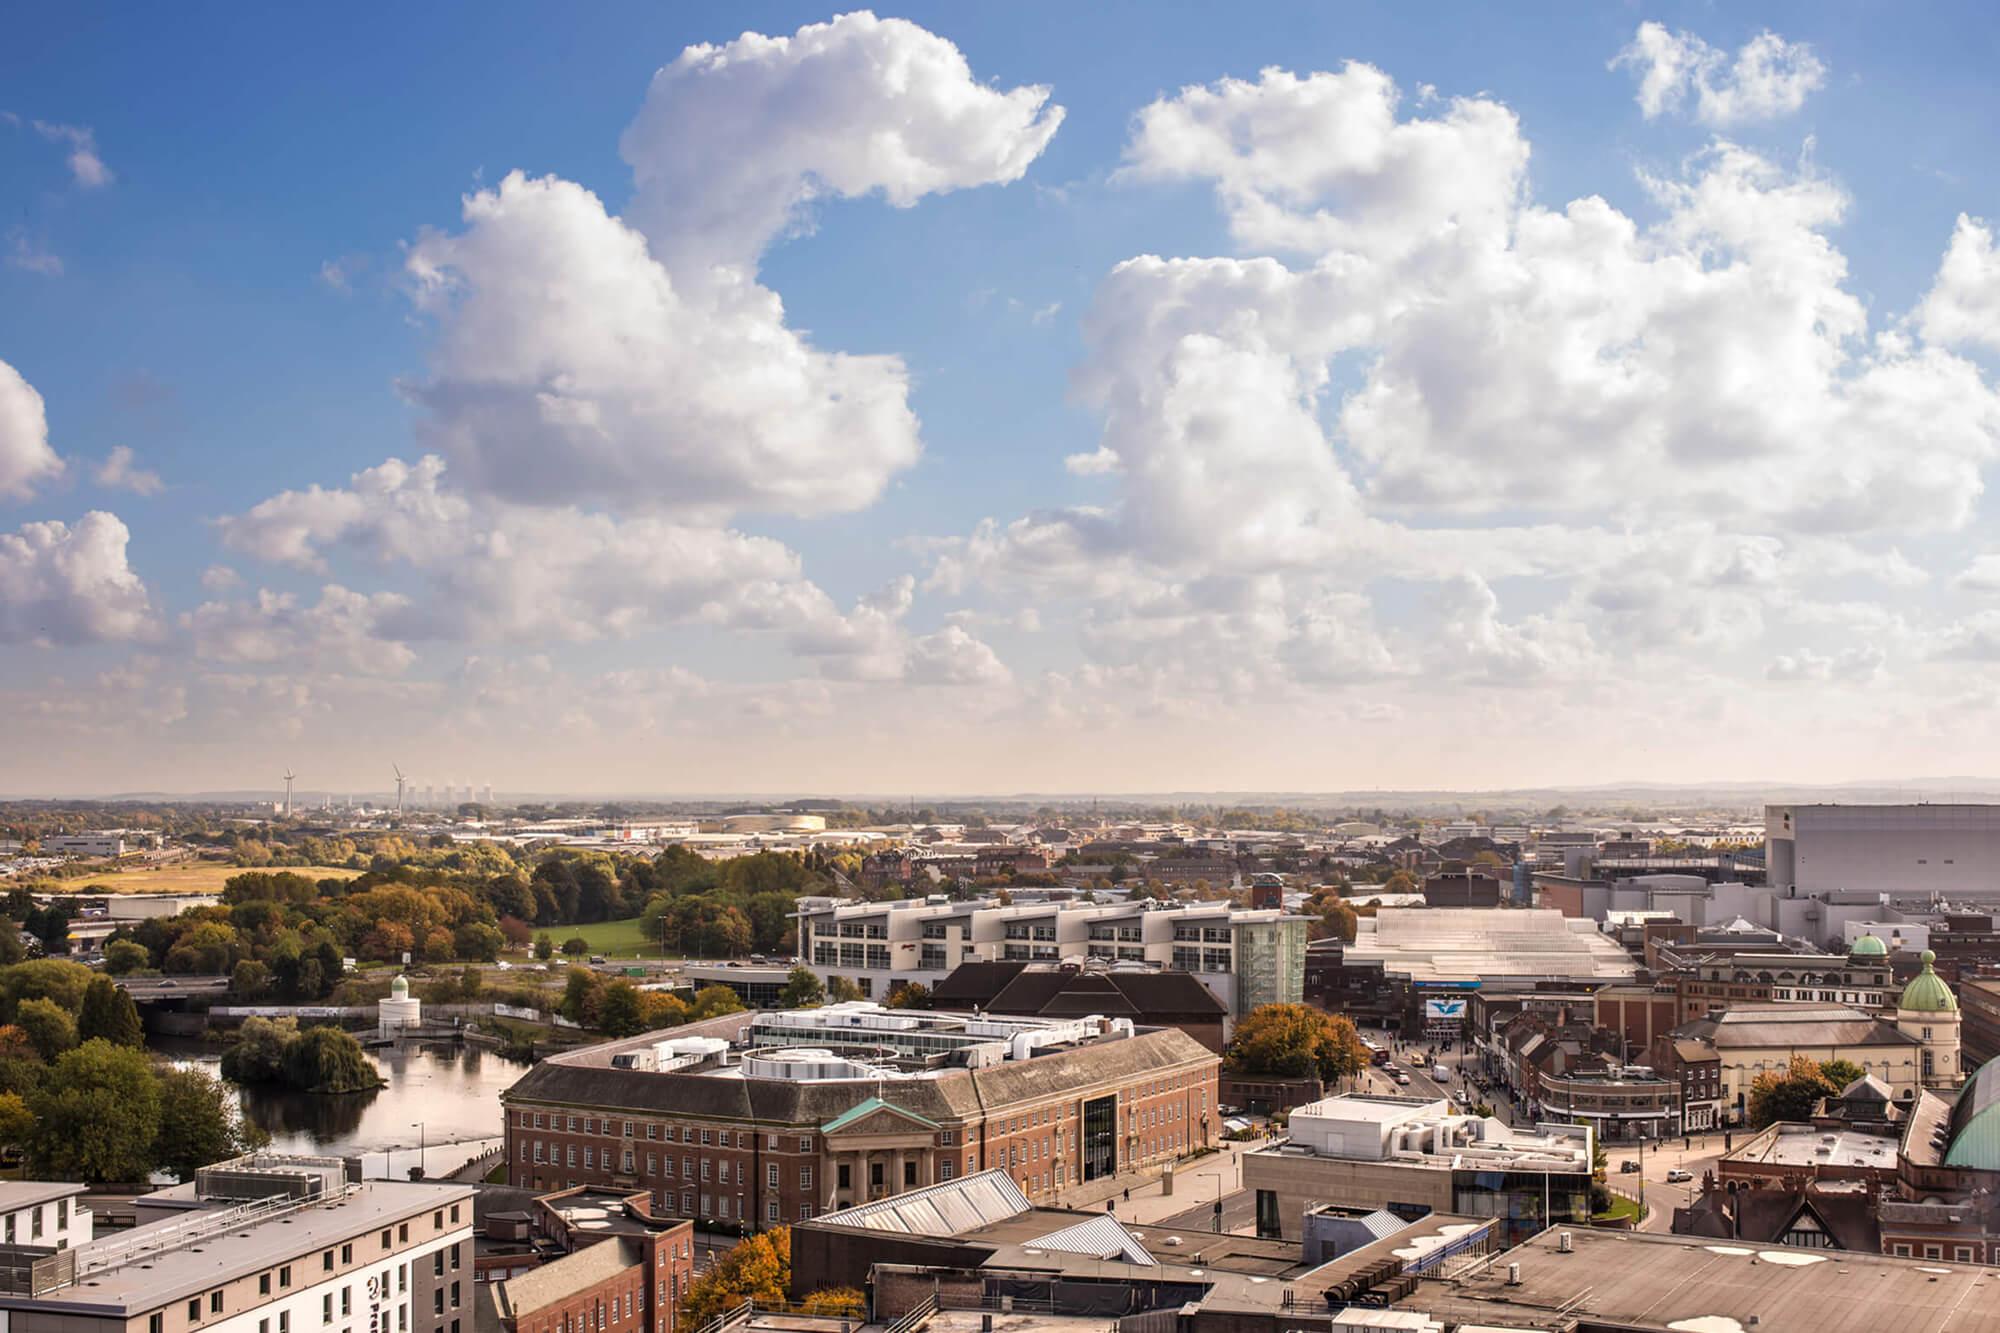 Birds eye view of Derby city centre.